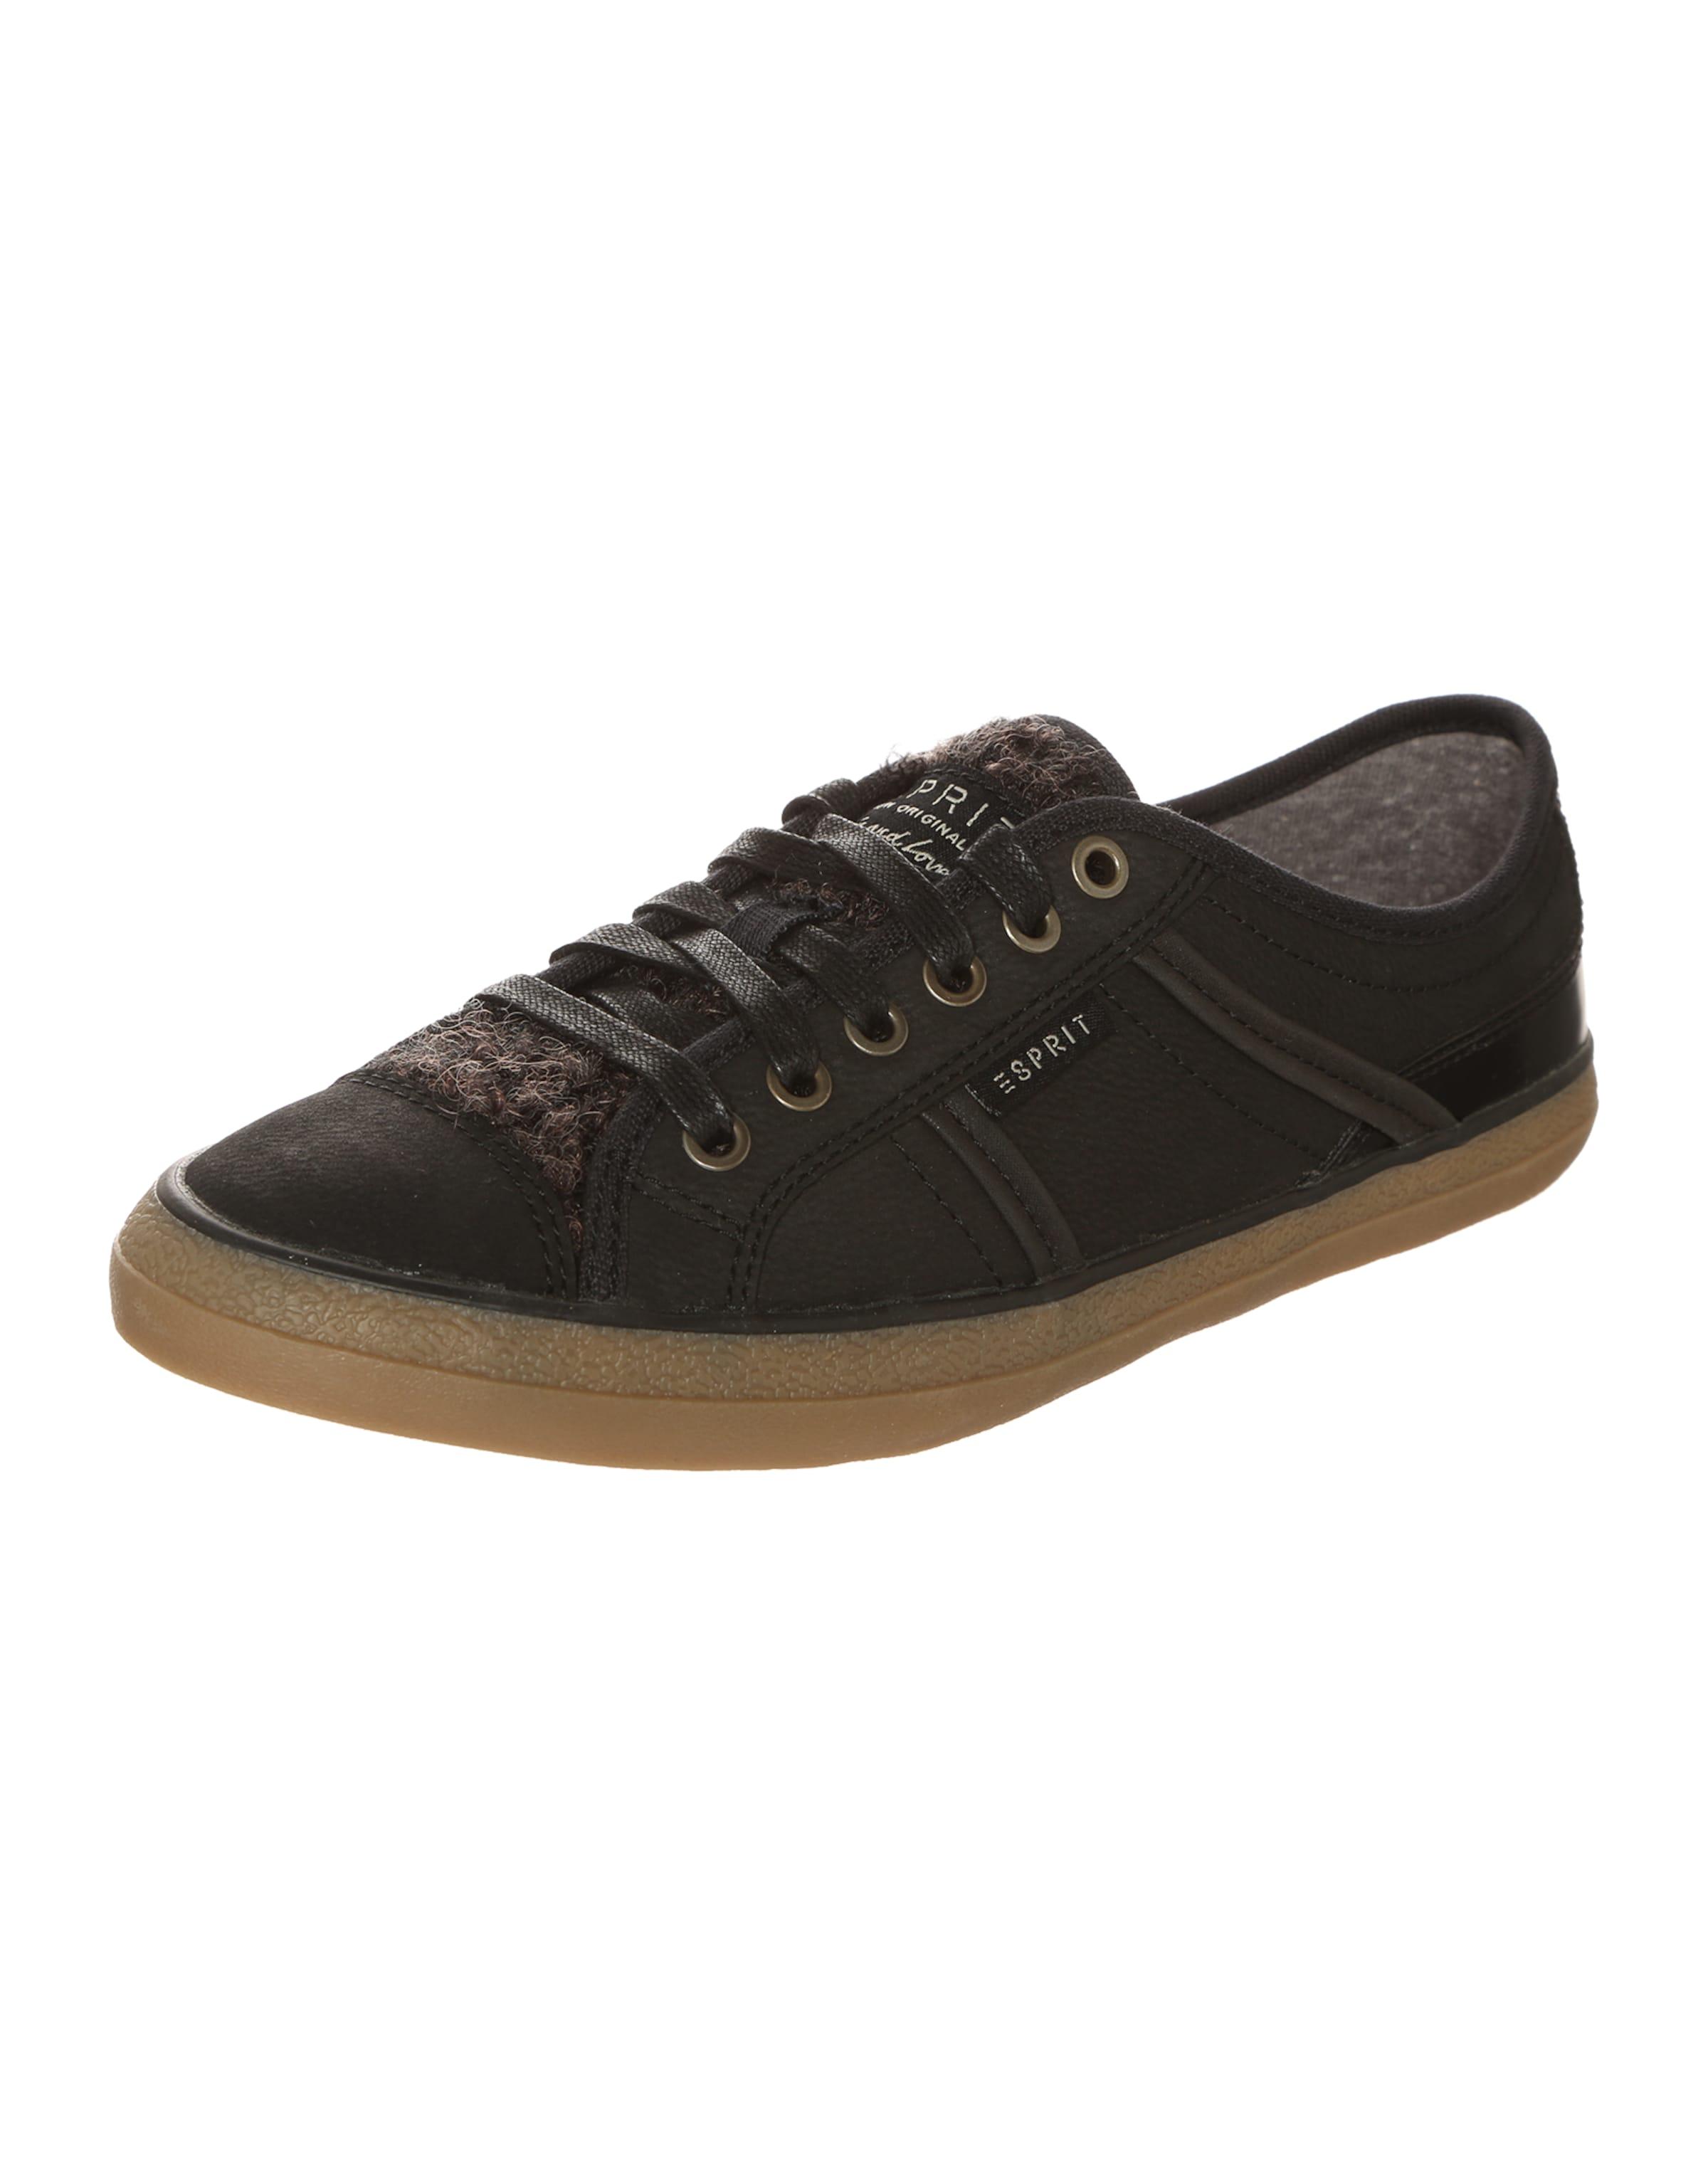 ESPRIT Sneaker Miana Verschleißfeste billige Schuhe